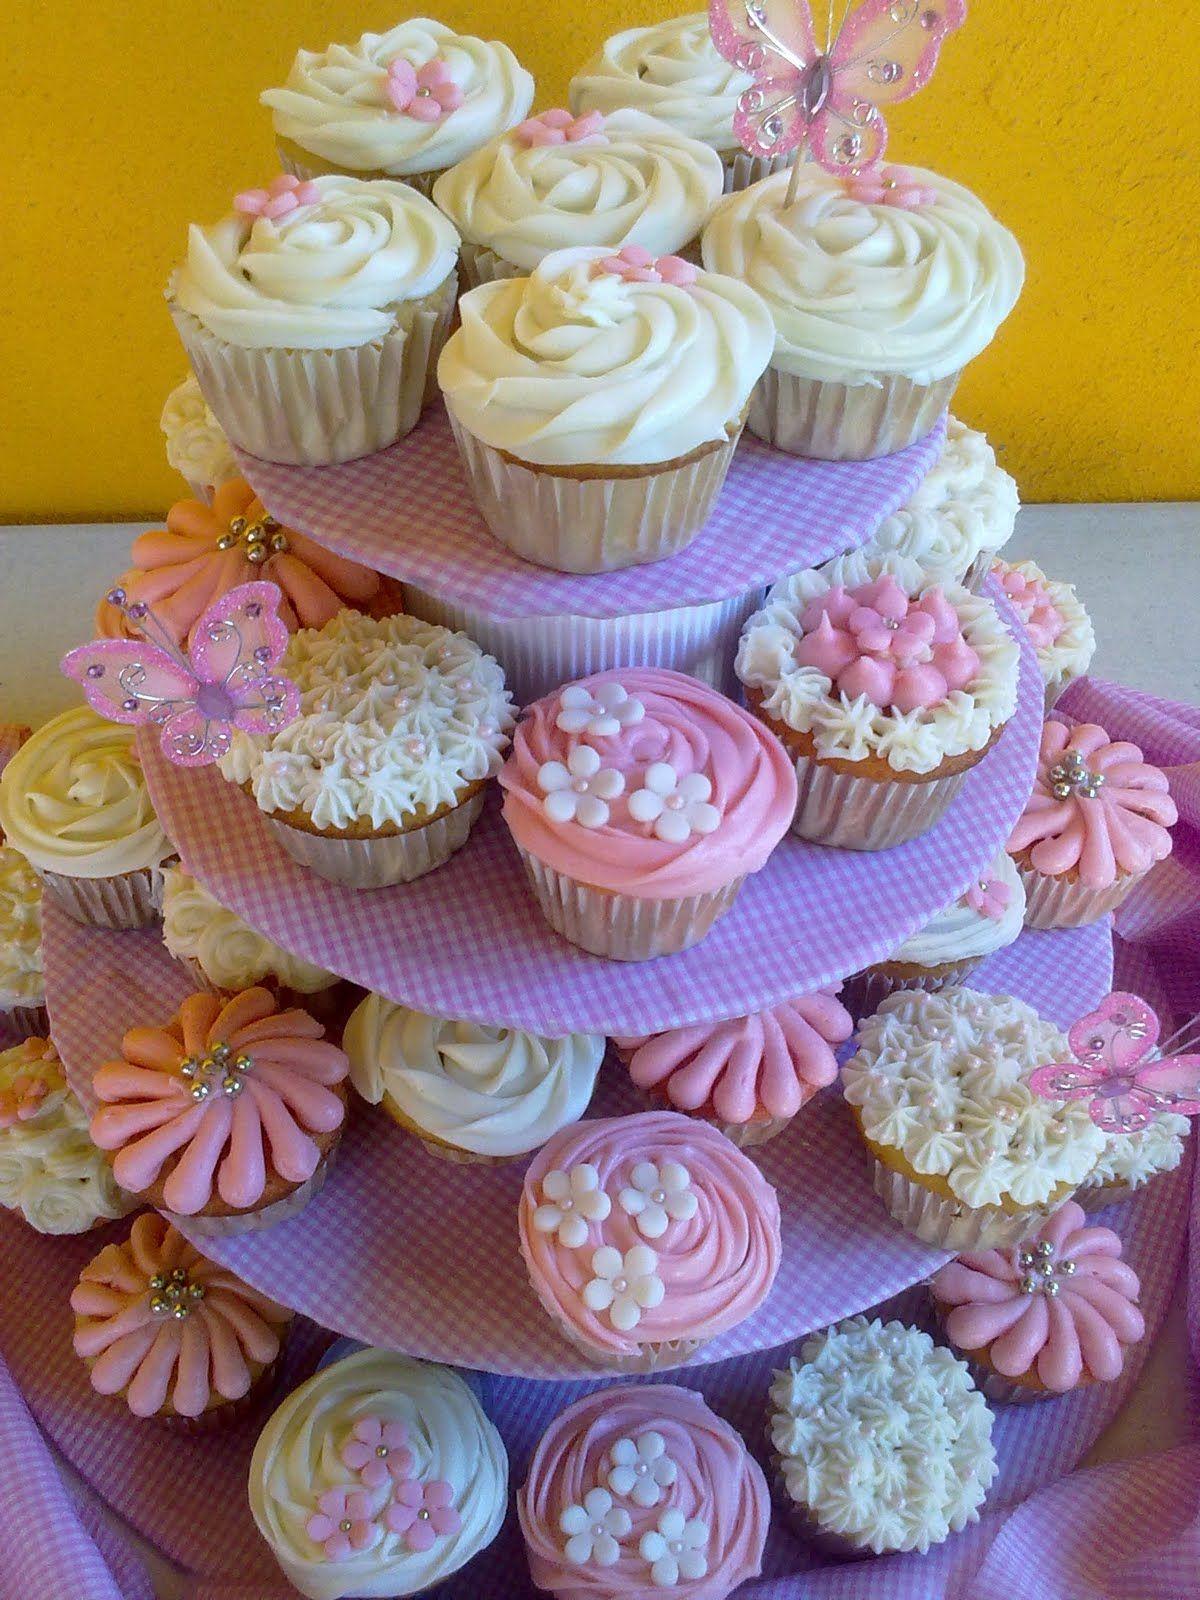 Pinterest Baby Shower Nino.Pinterest Baby Shower Cupcakes Kchelito S Cupcakes